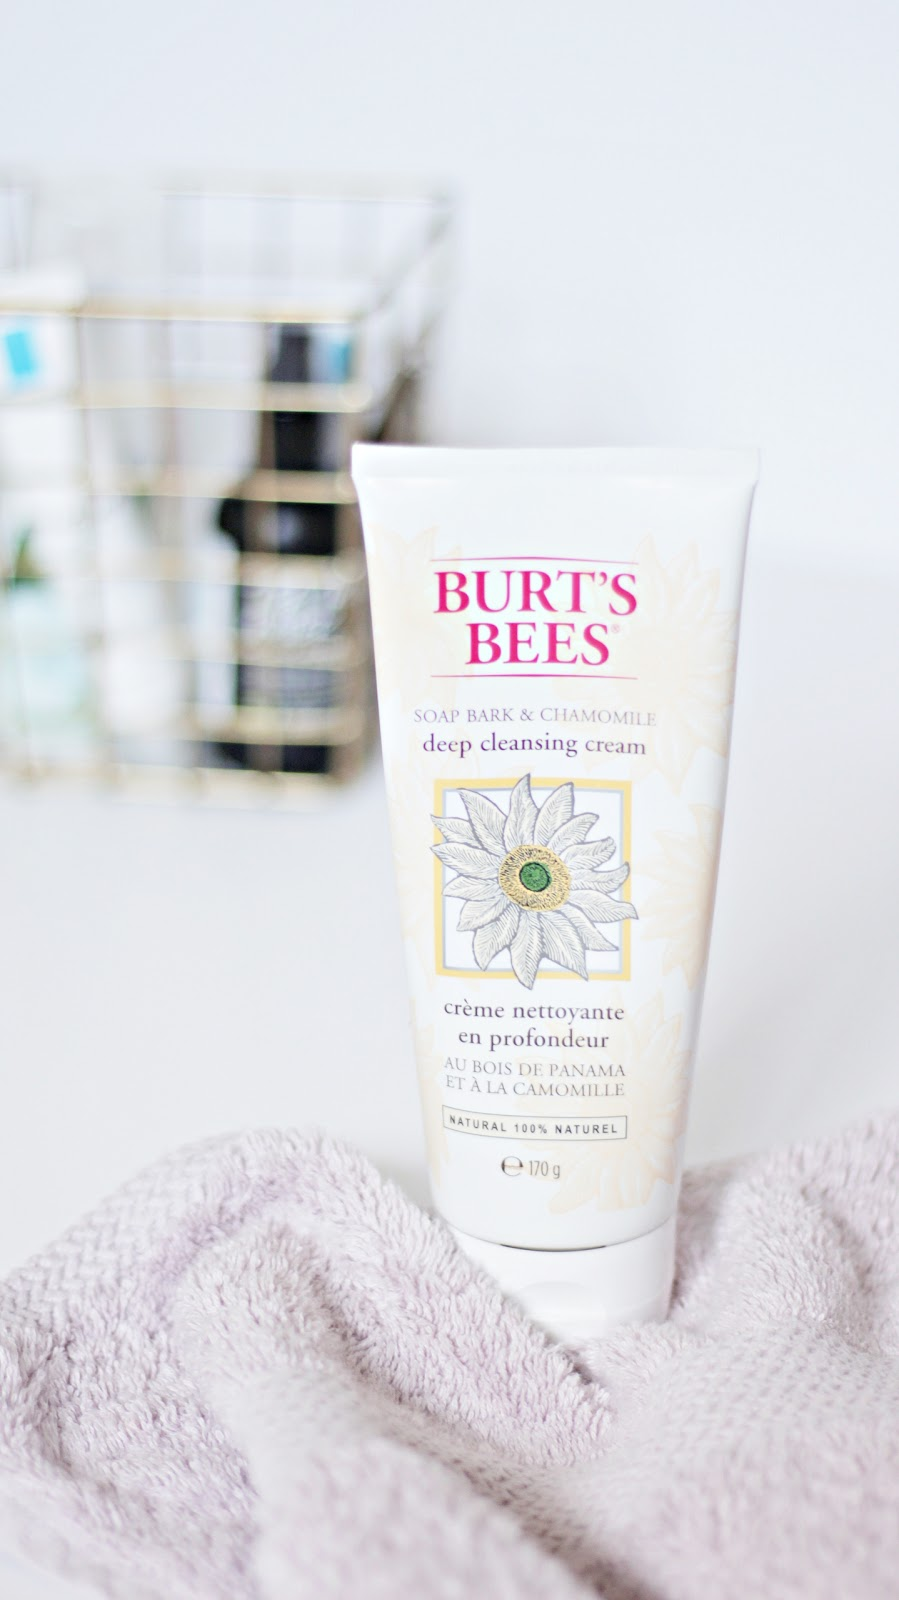 burt's bees deep cleansing cream